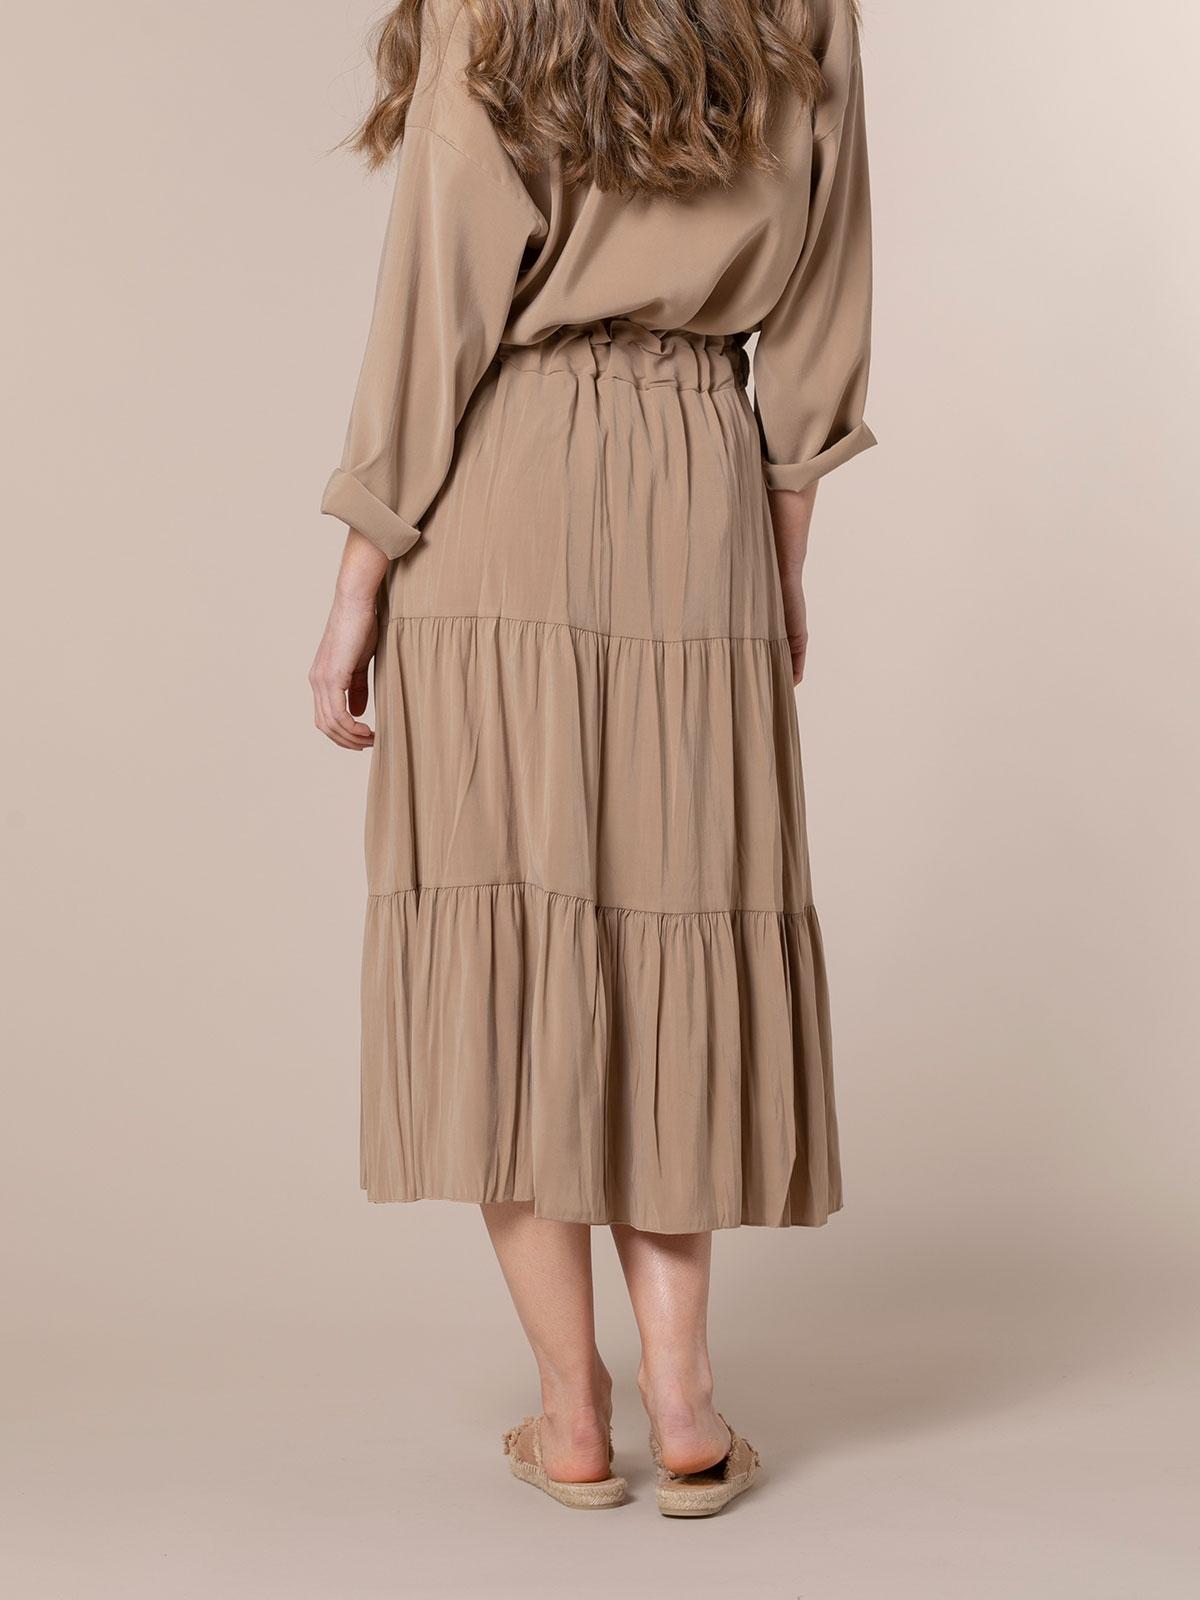 Falda midi cortes Camel